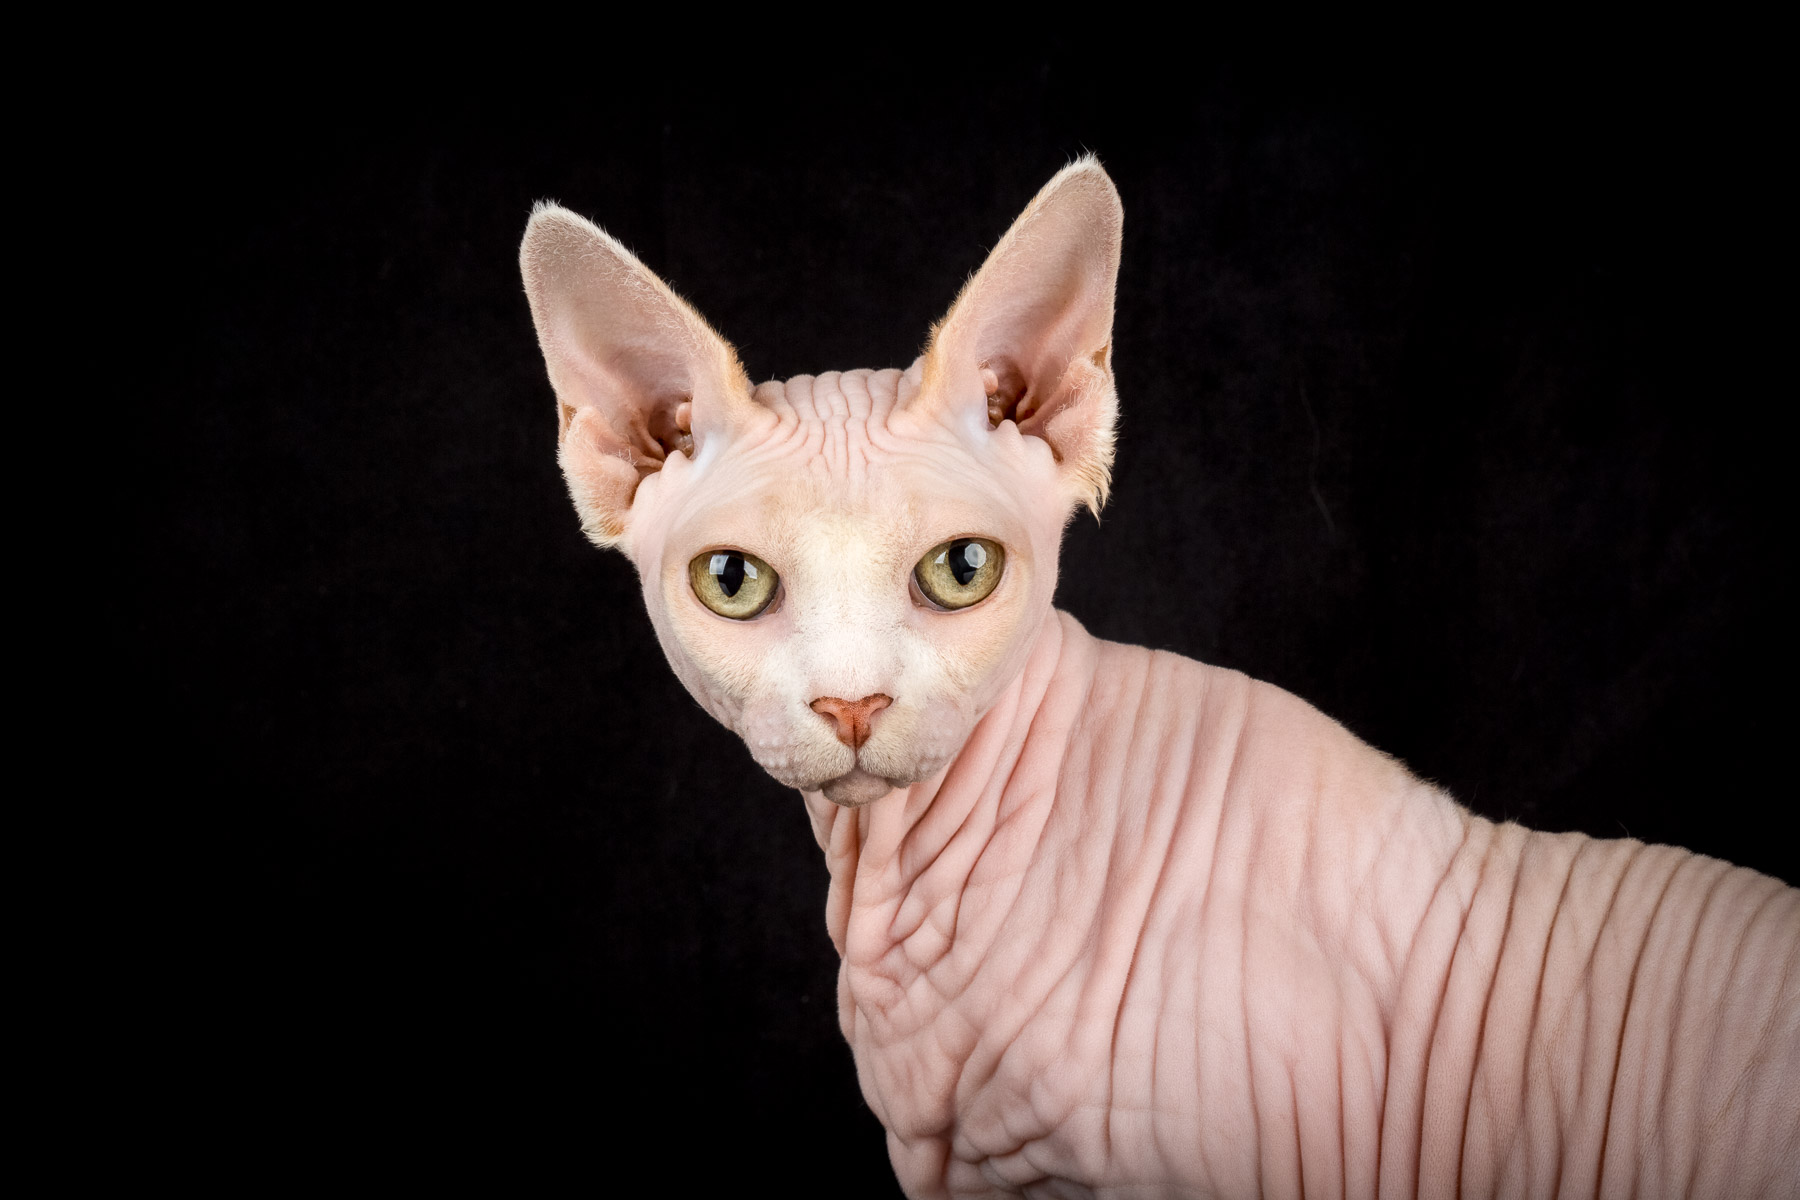 6Sphynx-cat-hairless-cat-photographer-pets-alicia-rius.jpg